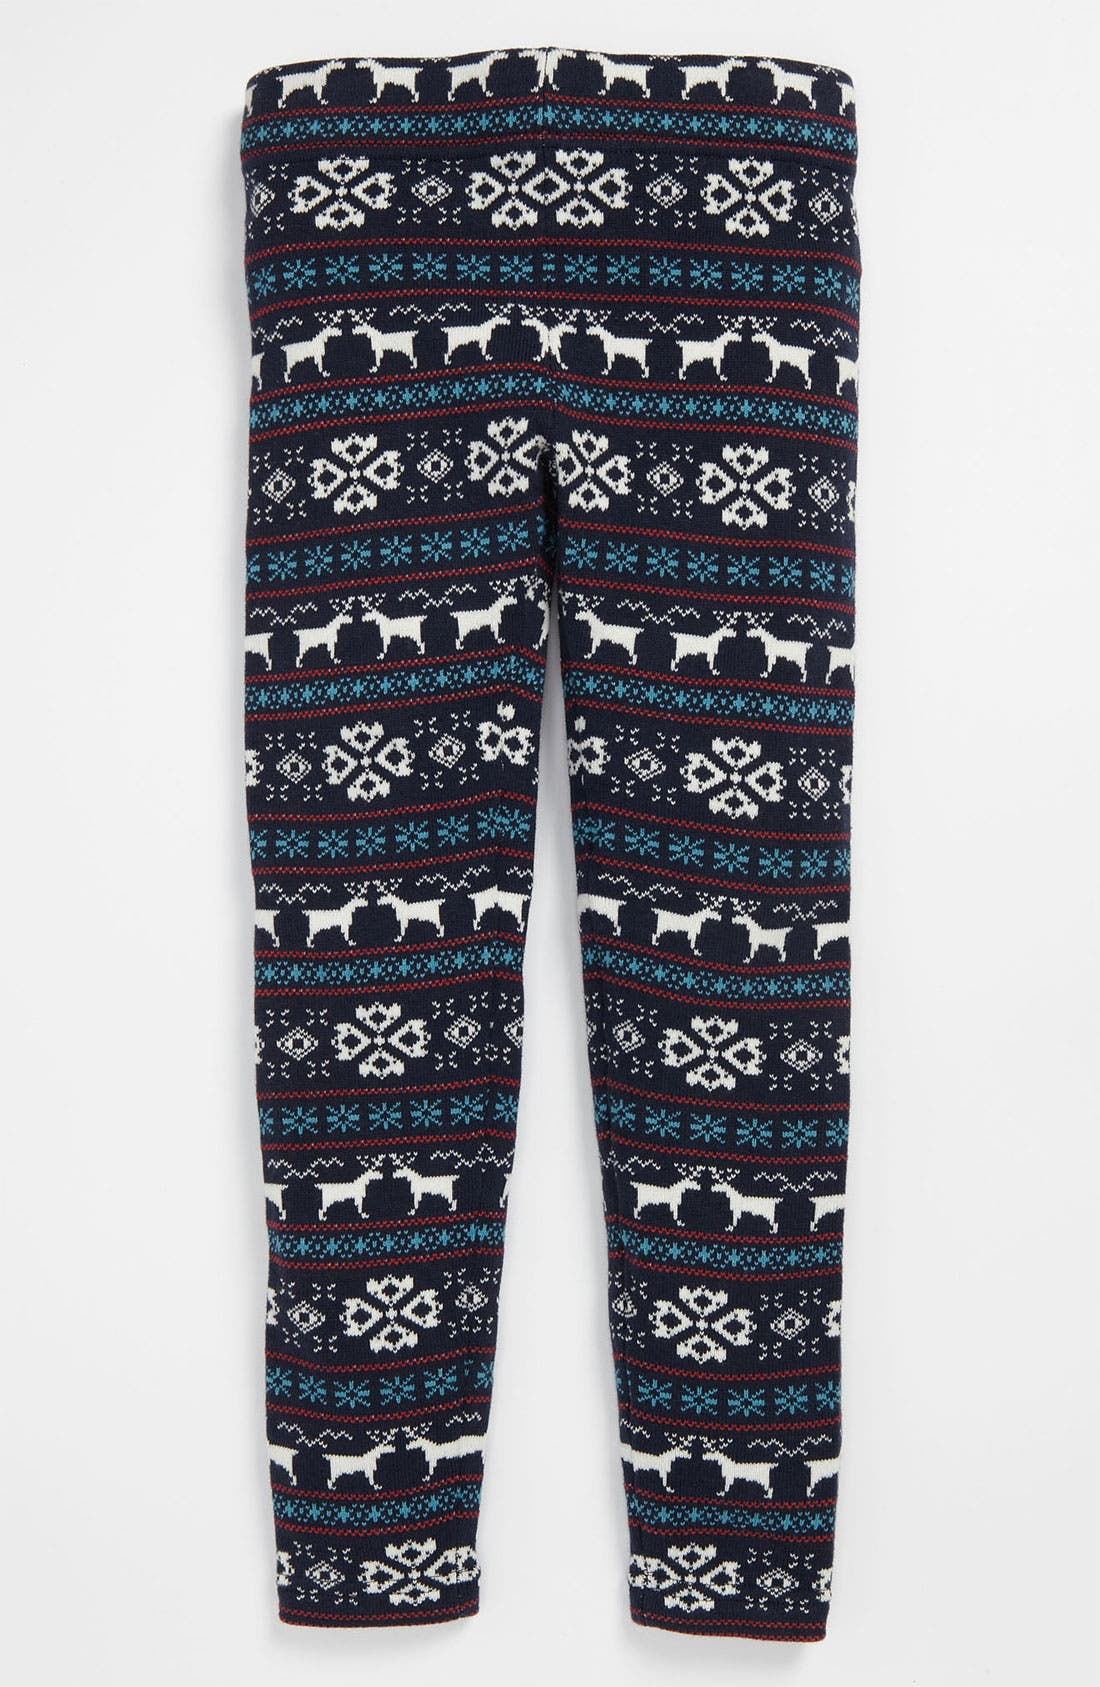 Alternate Image 1 Selected - Tucker + Tate 'Millie' Knit Leggings (Big Girls)